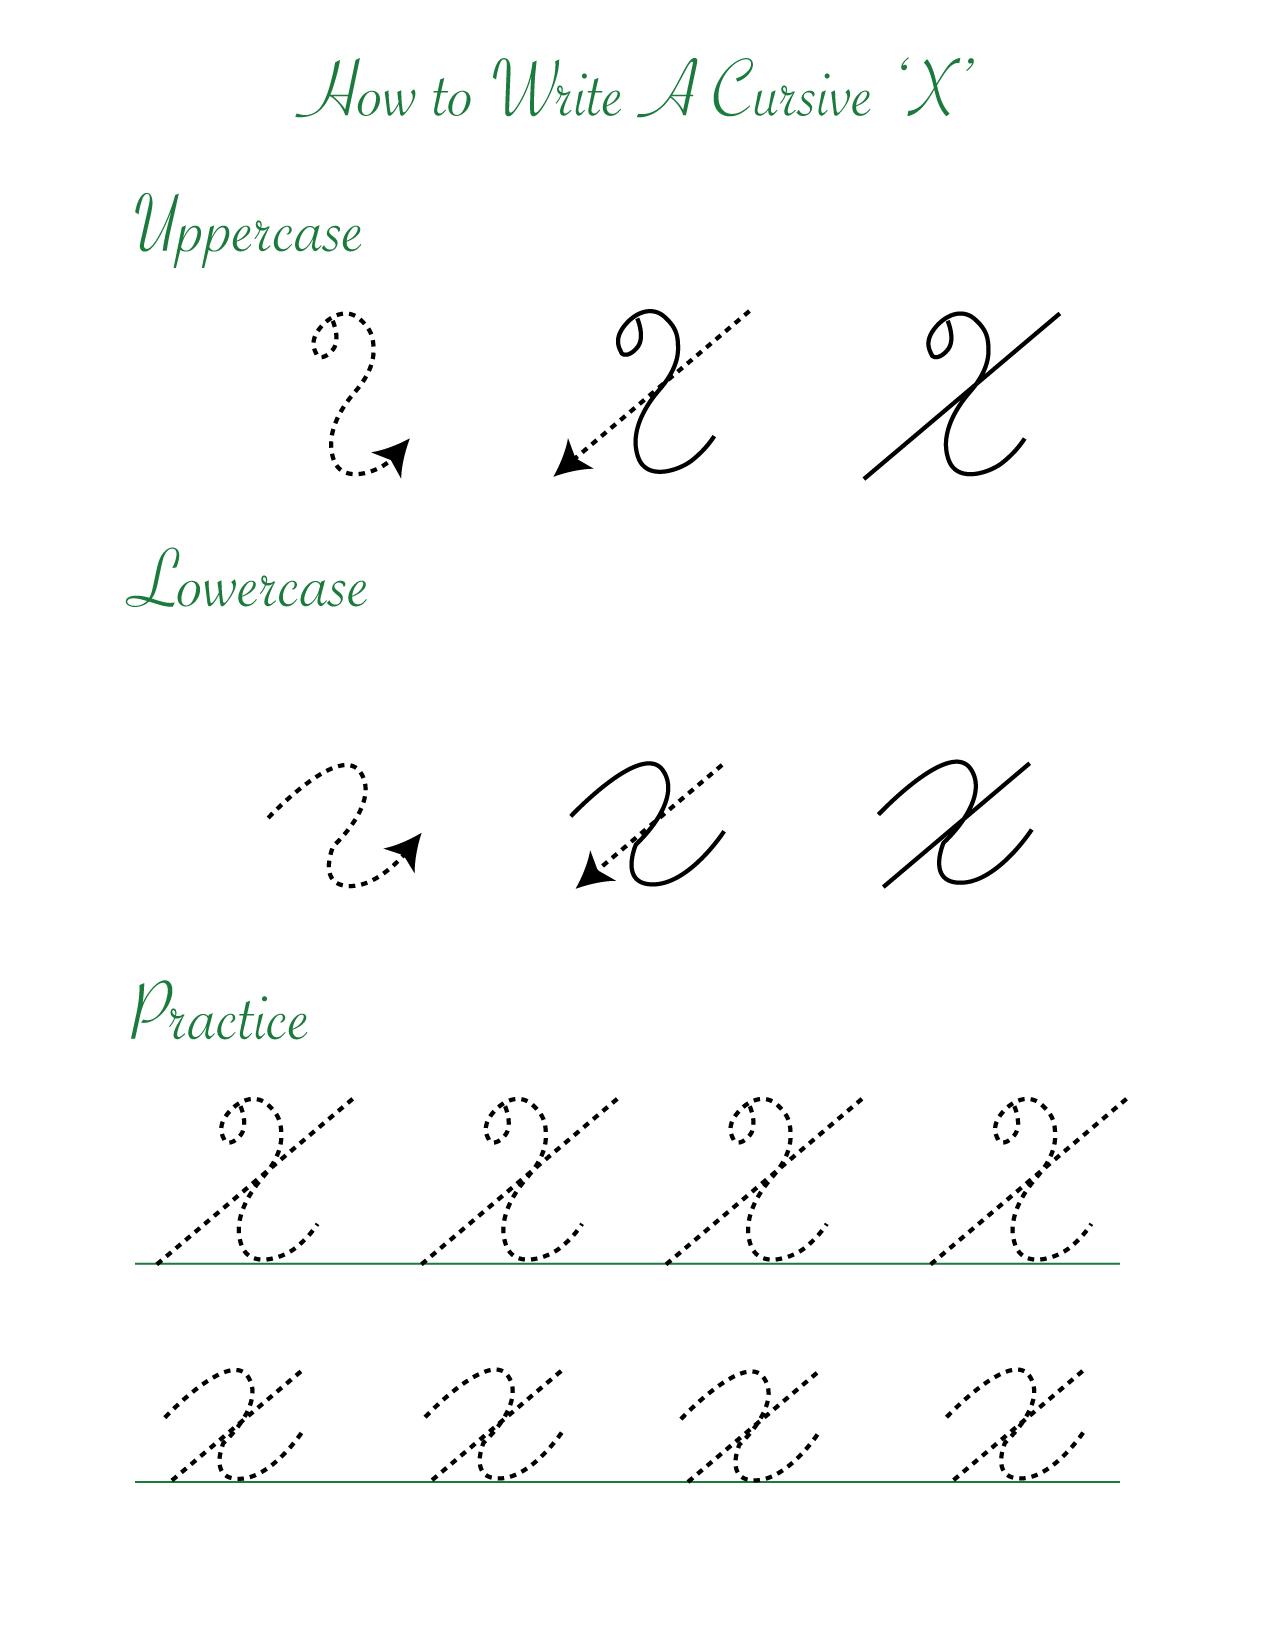 How to write a cursive X